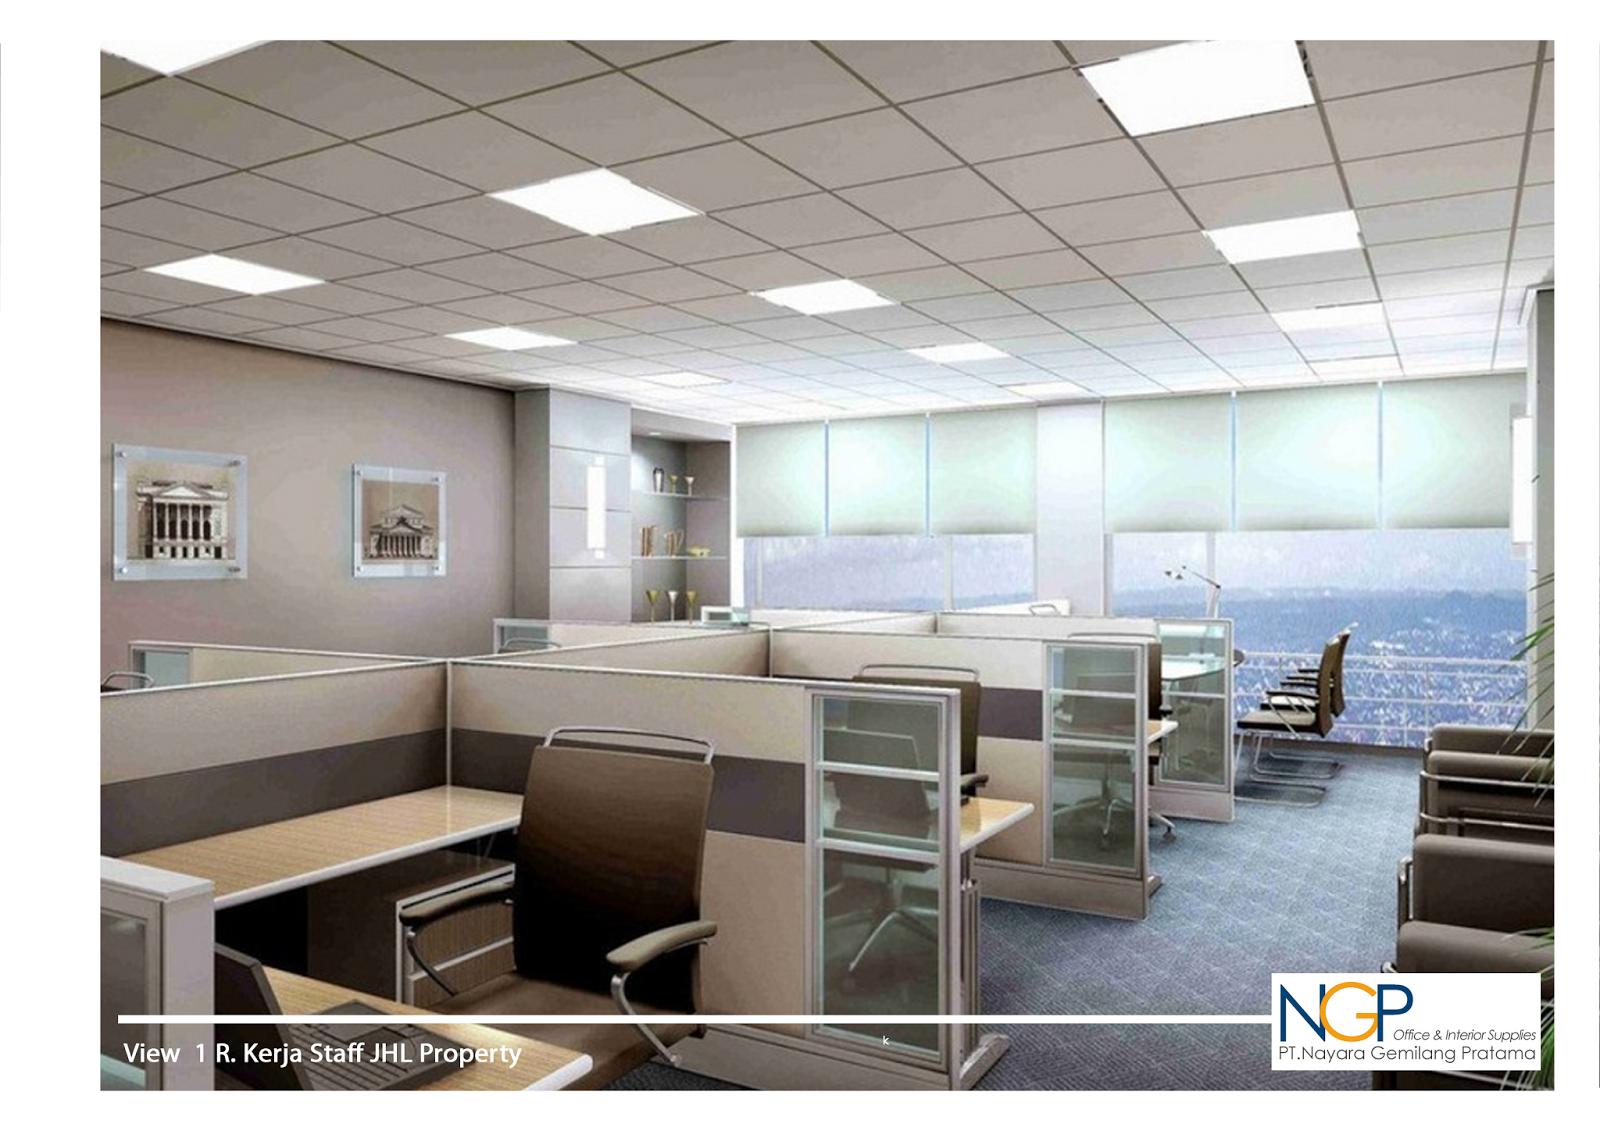 interior design in office. Design Office Interior In L